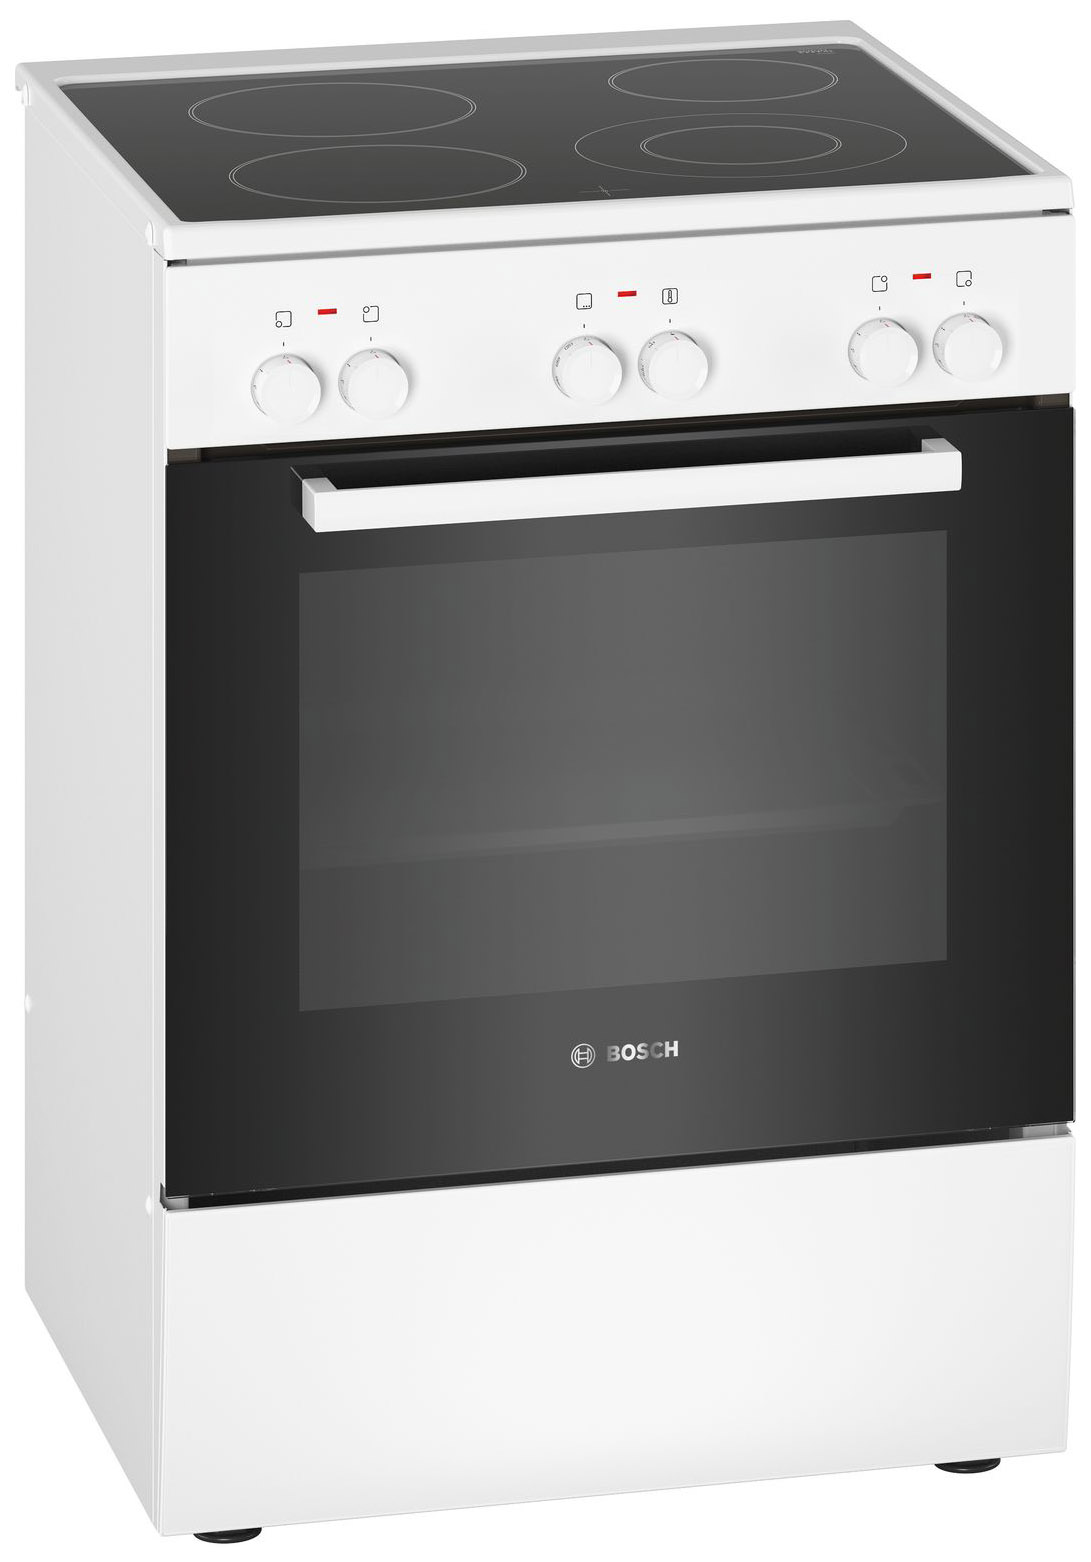 Электрическая плита Bosch Serie | 2 HKL090120